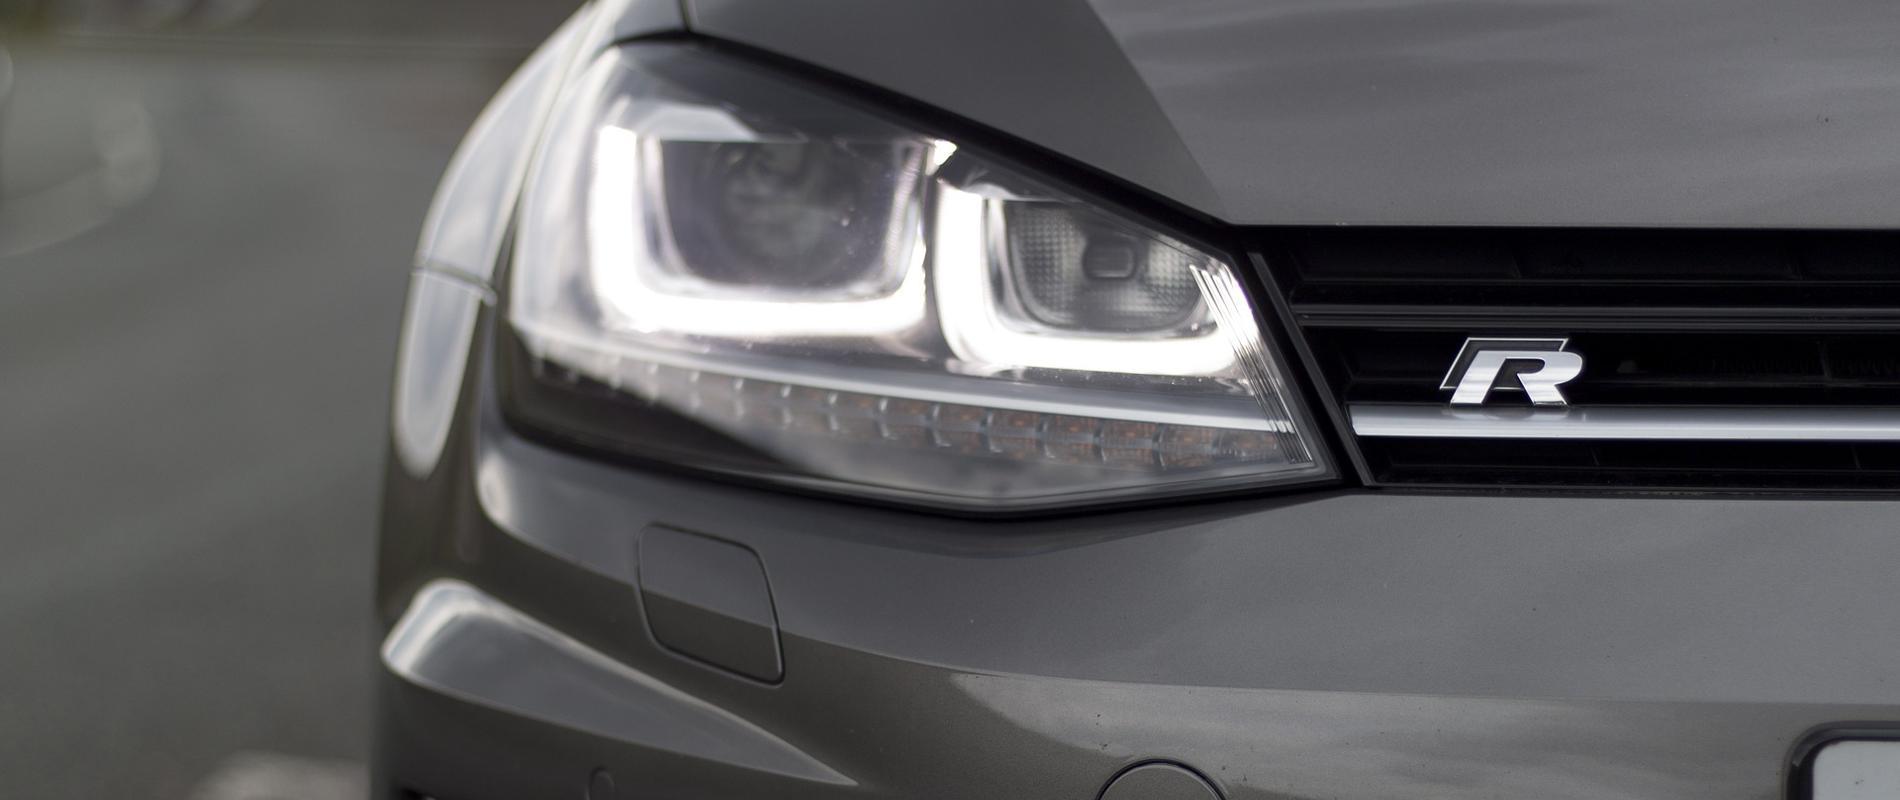 Orion Cars vendita automobili usate Roma